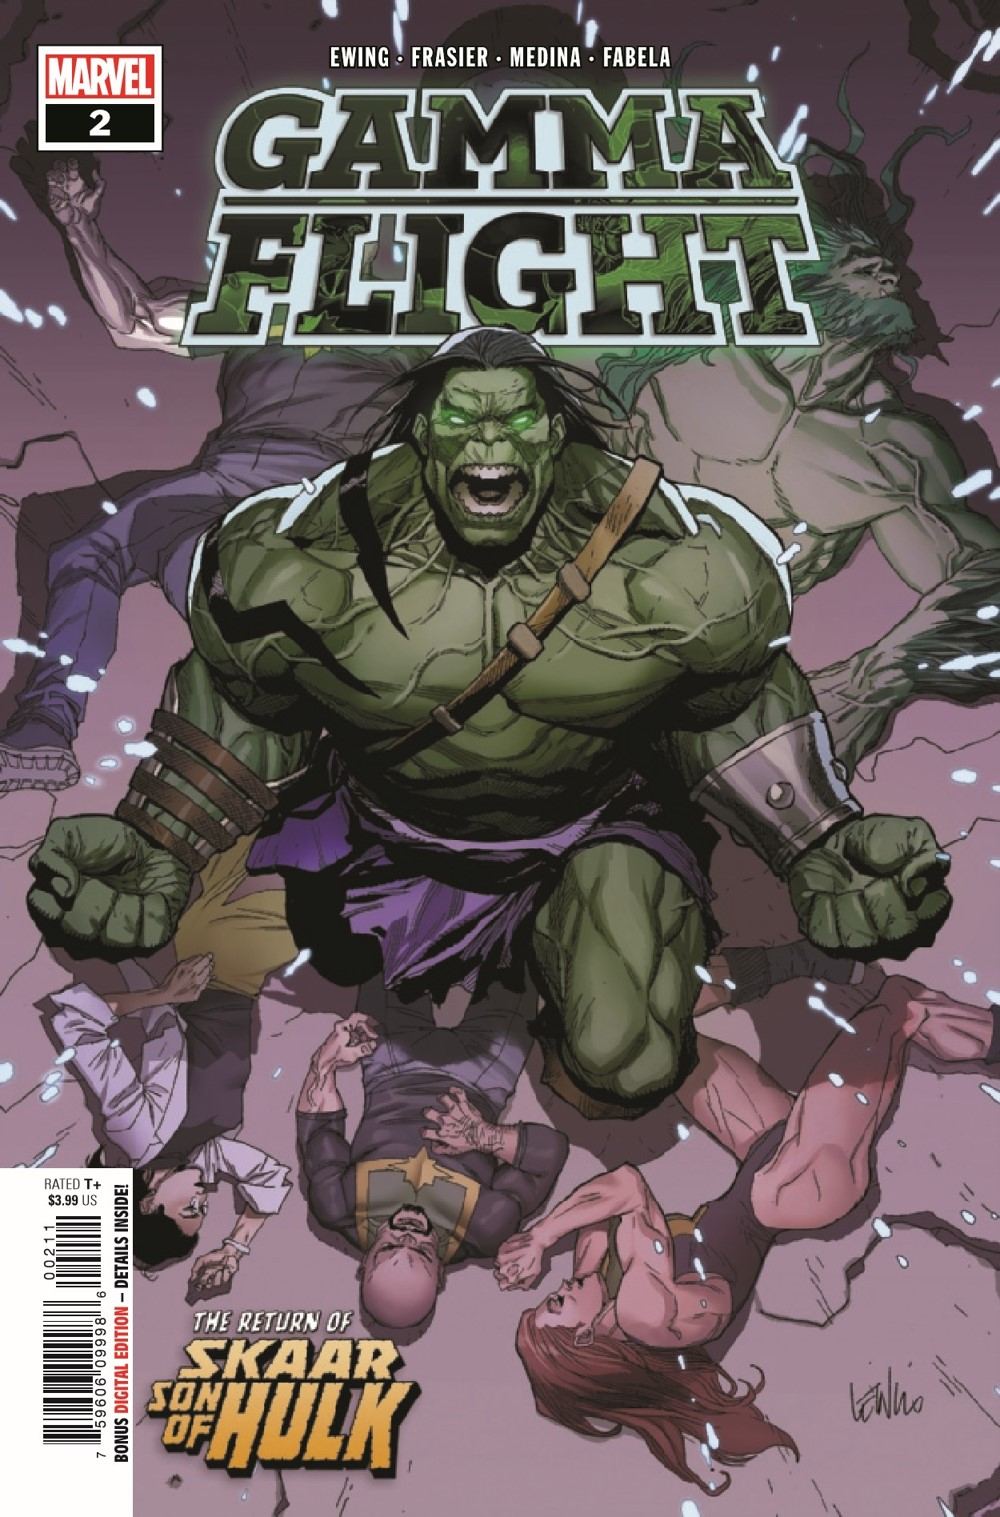 GAMMAF2021002_Preview-1 ComicList Previews: GAMMA FLIGHT #2 (OF 5)